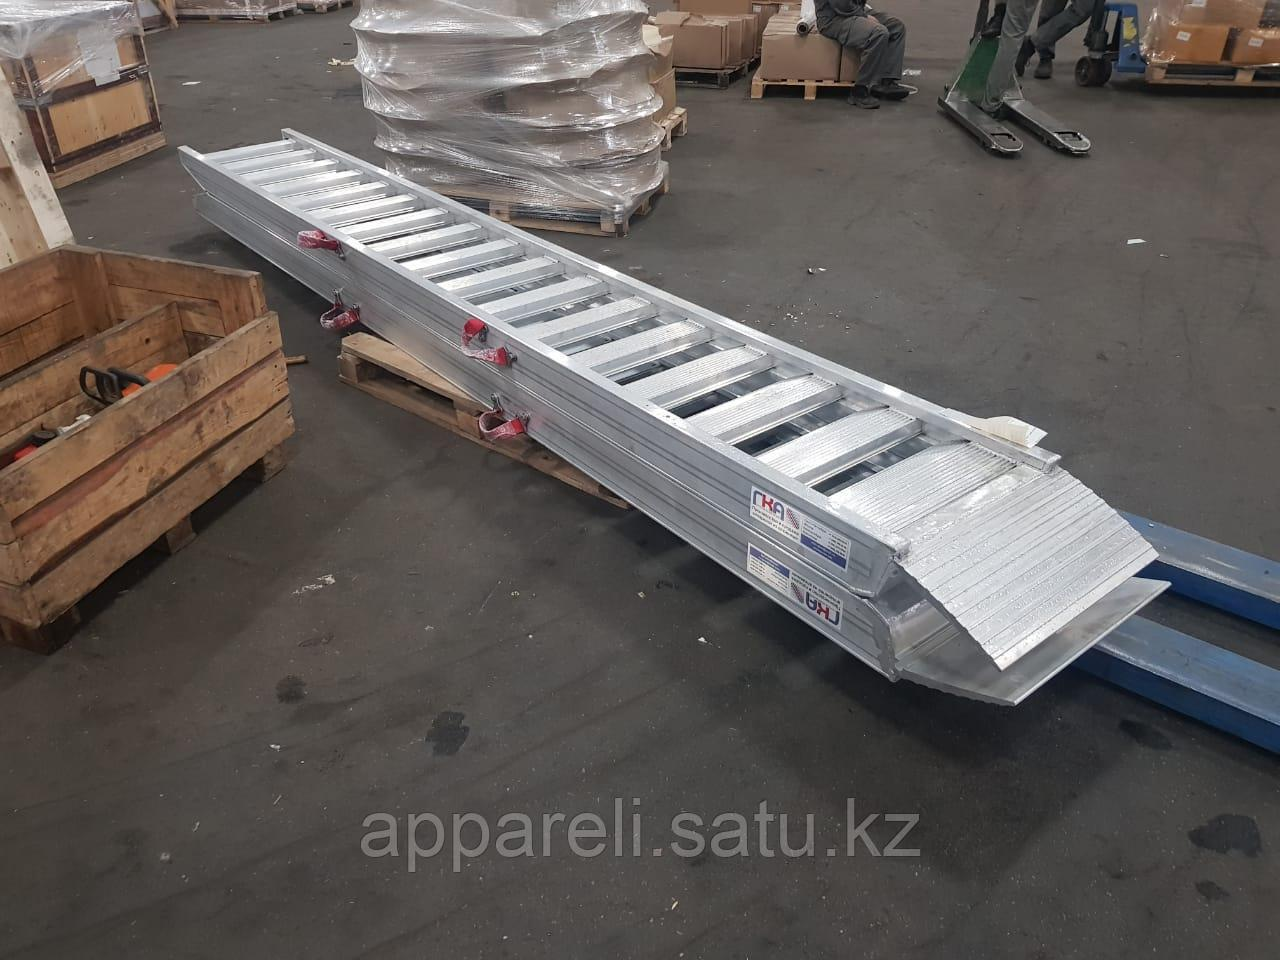 Алюминиевые аппарели от производителя 4 метра, 6 тонн